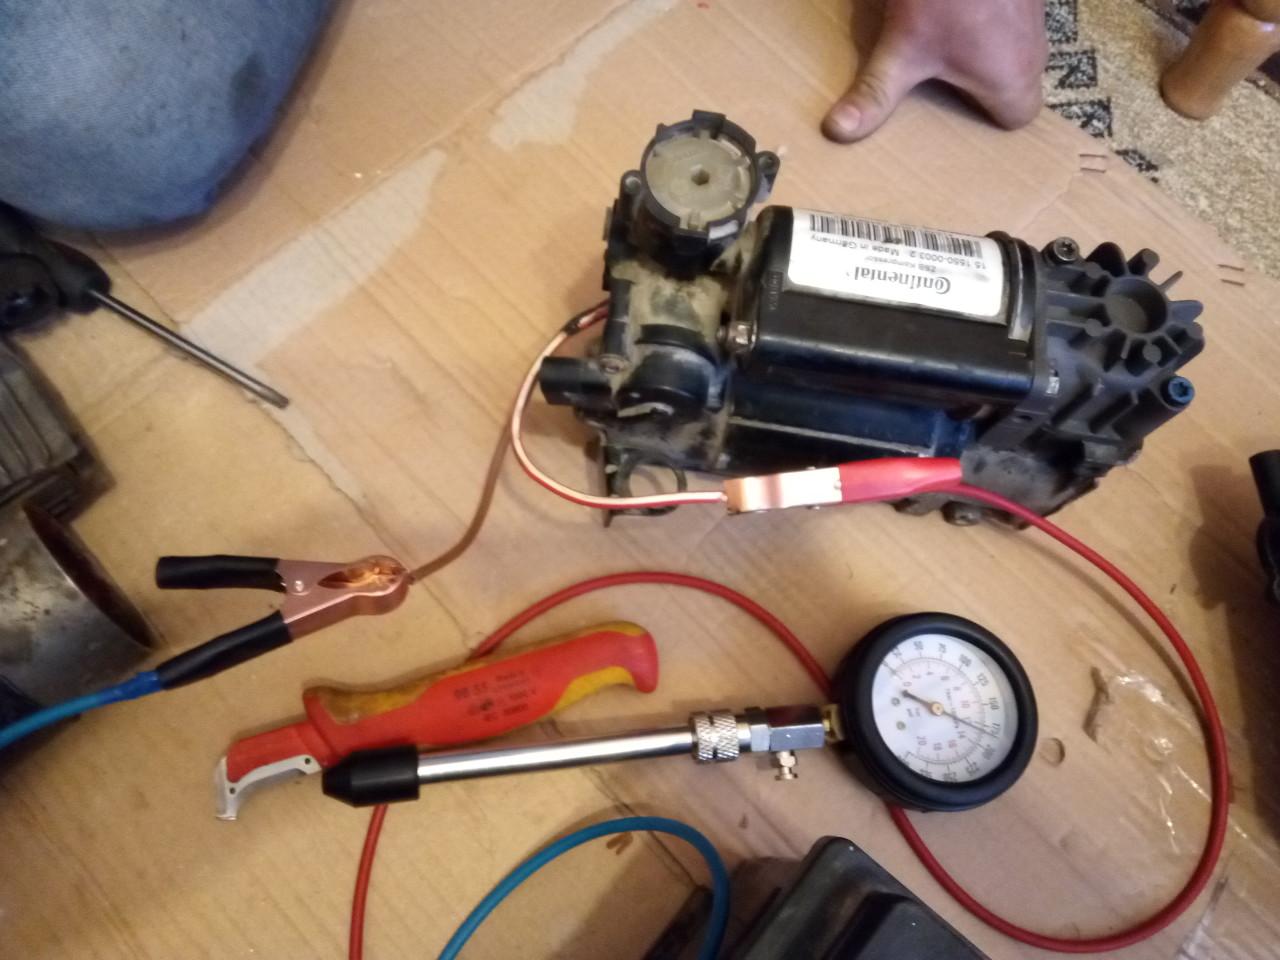 Kit reparatii reparare recondiționare compresor perne aer, Chiuluasa, camasa piston wabco